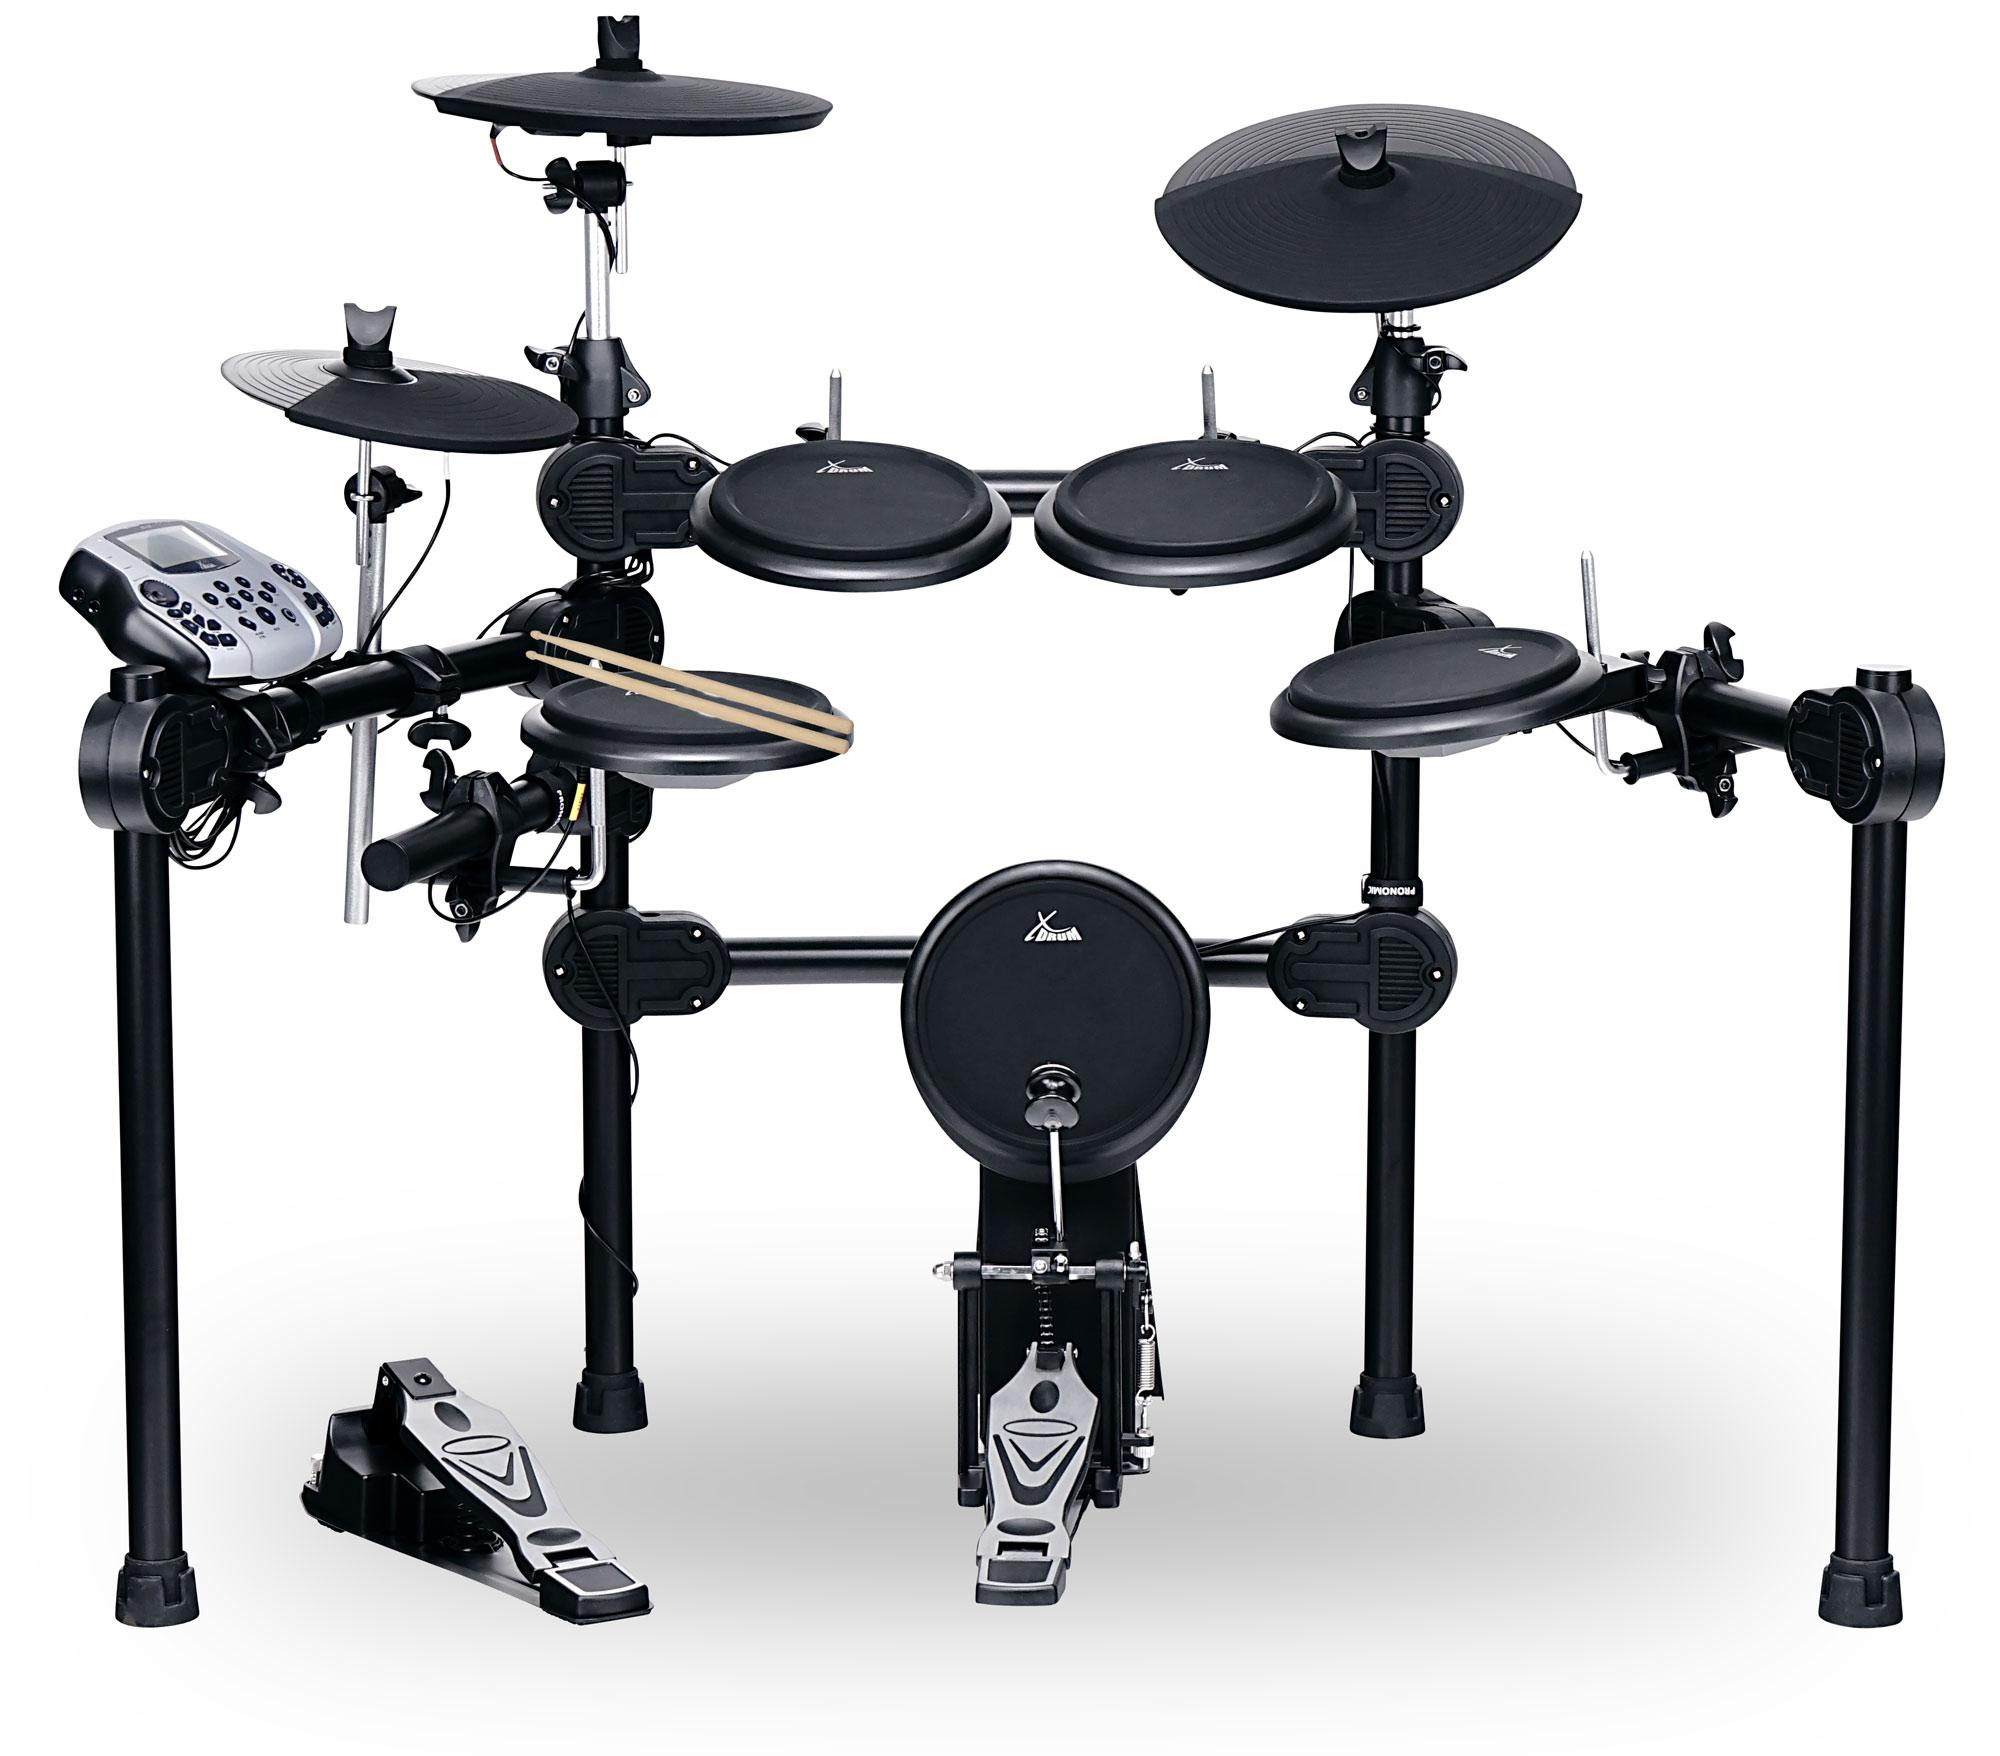 Xdrum Dd 520 Electronic Drum Kit